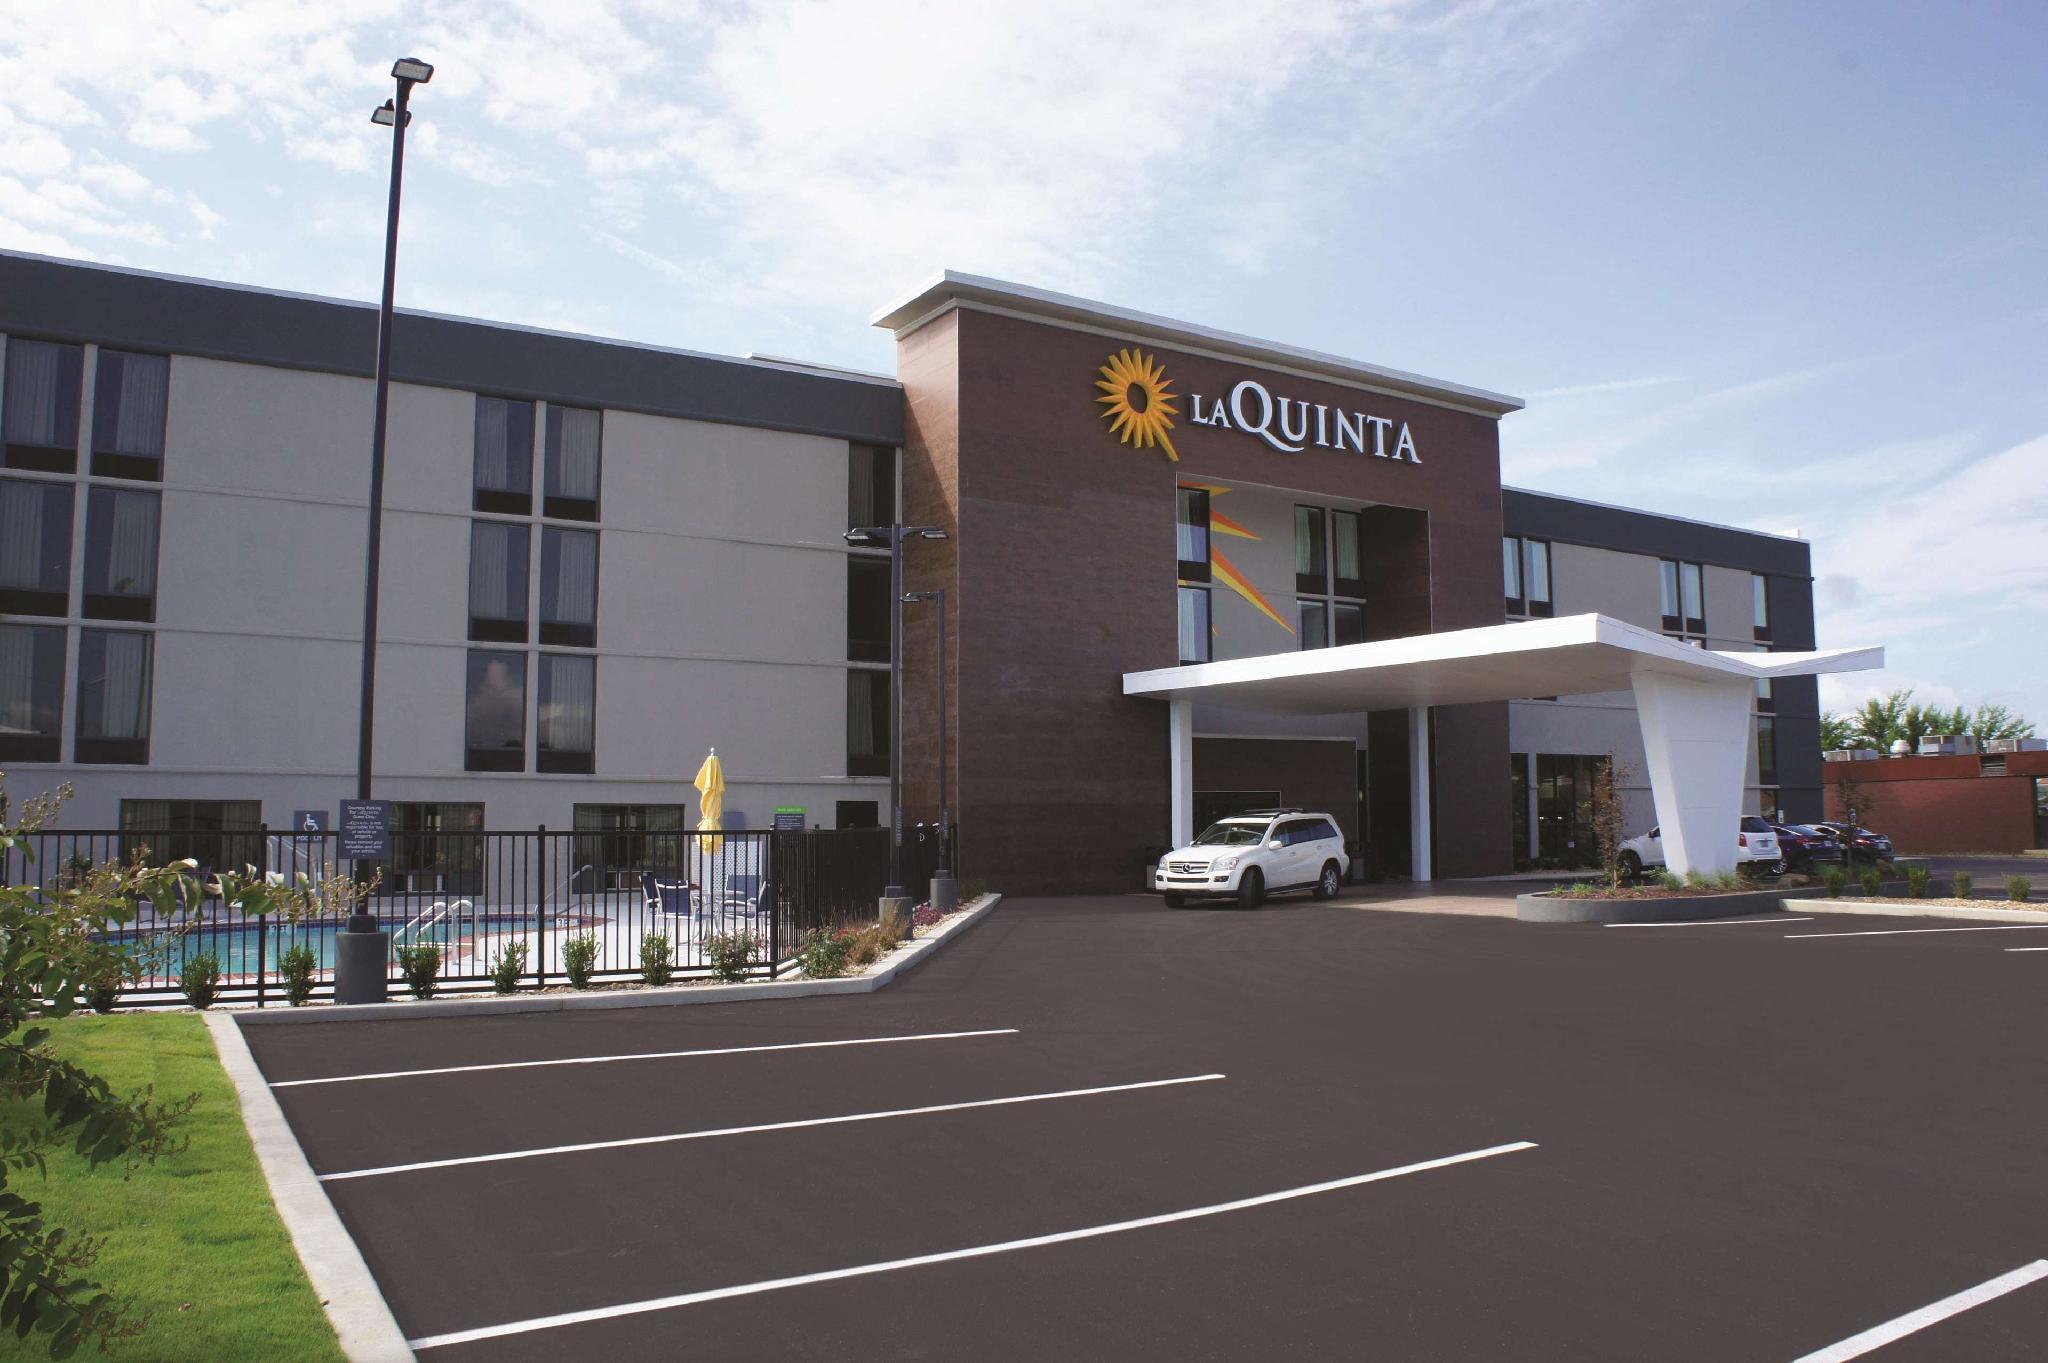 La Quinta Inn And Suites By Wyndham Columbus MS